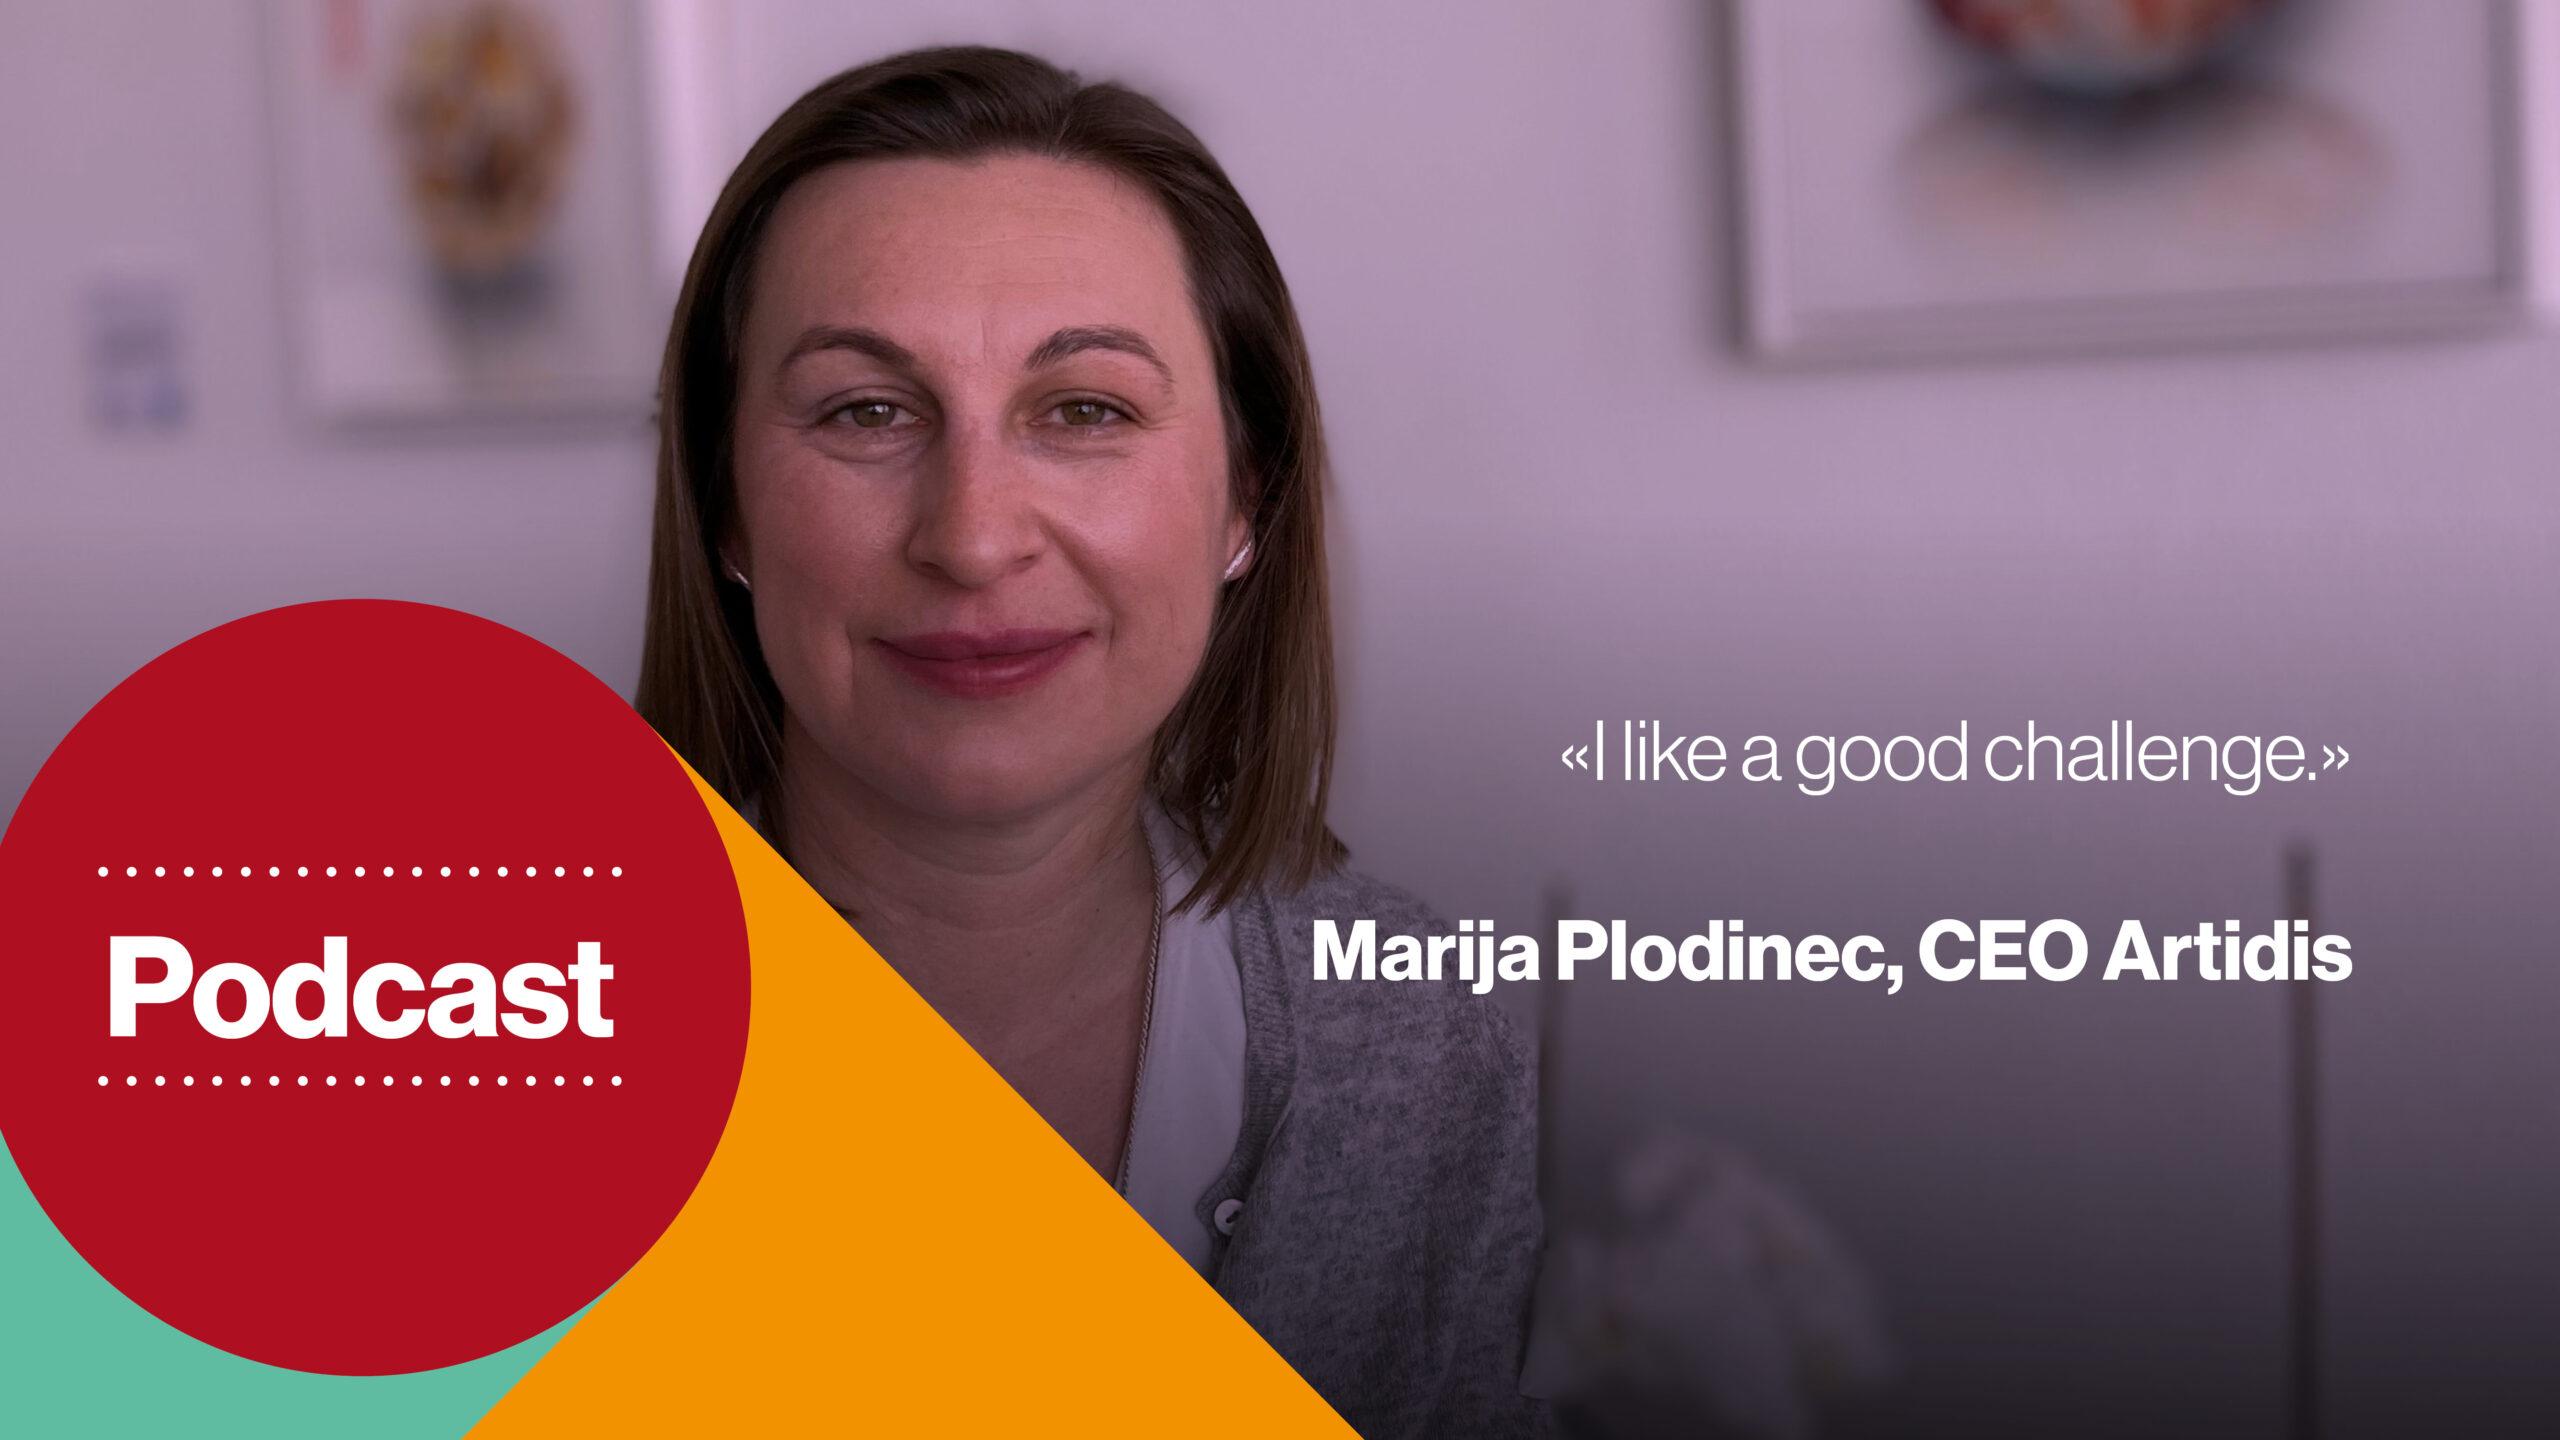 Marija Plodinec, CEO Artidis